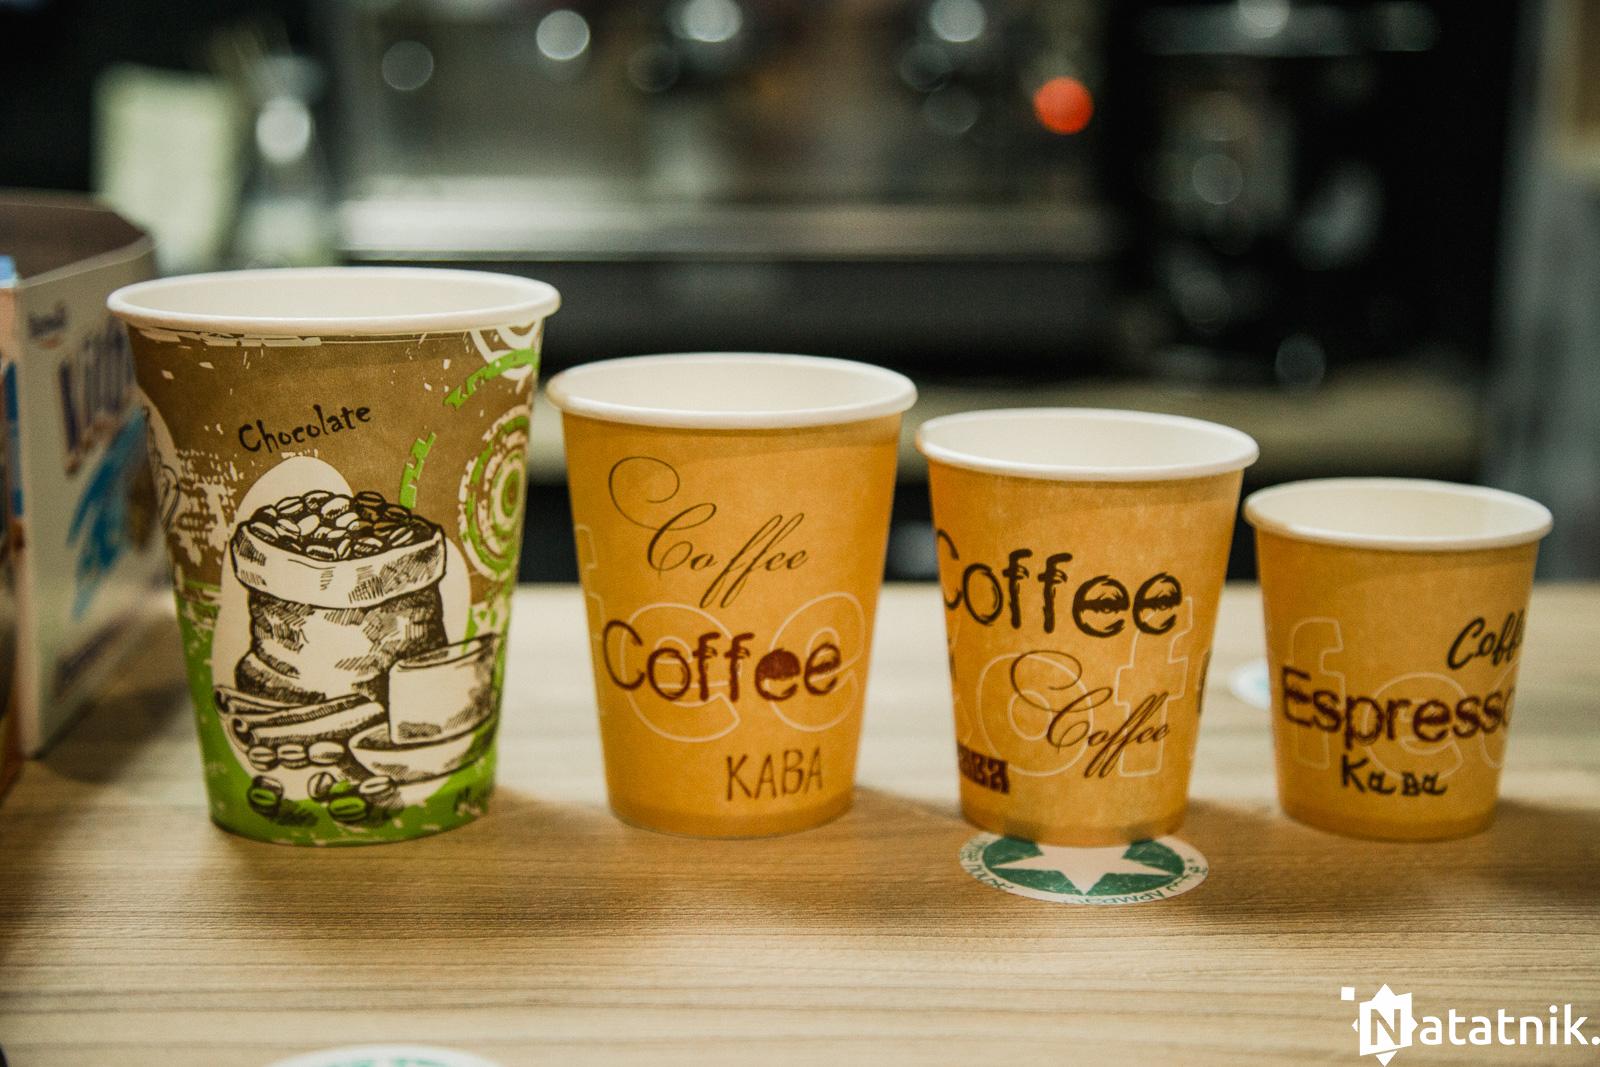 кофейный брест, кофе